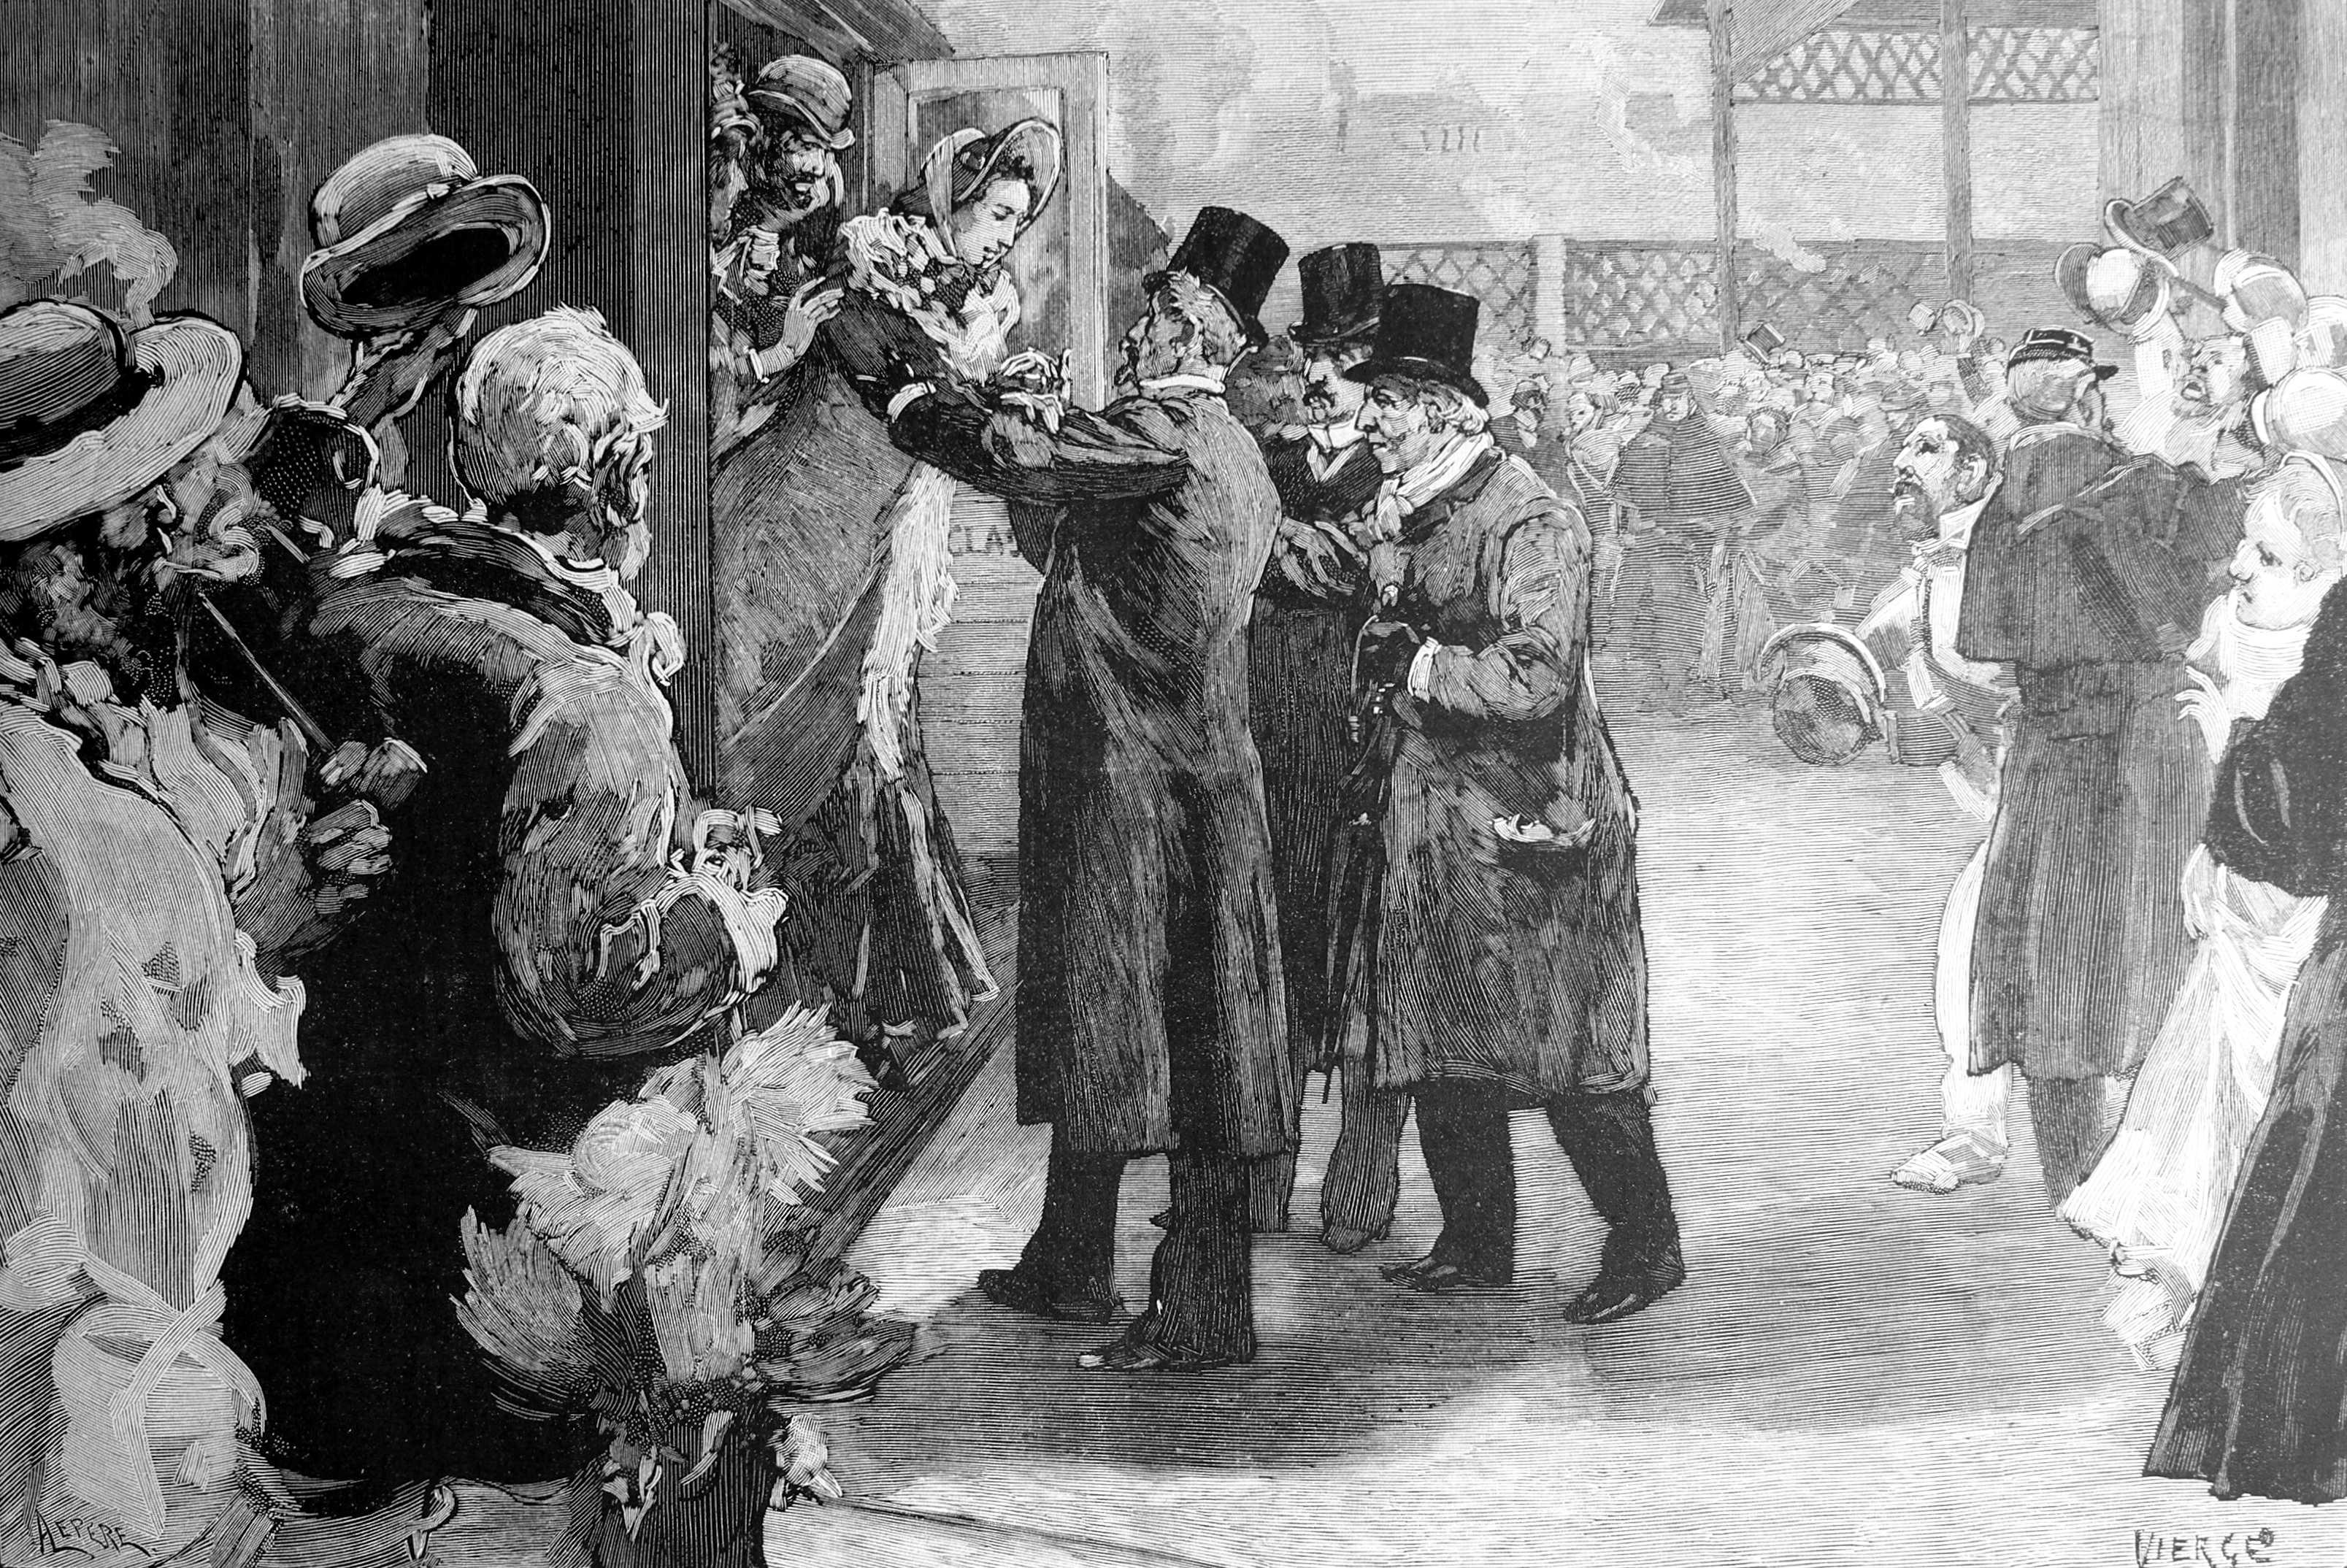 Arribada de Louise Michel a l'estació de Saint-Lazare de París on és rebuda per Henri de Rochefort, Louis Blanc i Georges Clémenceau. Dibuix de Vierge